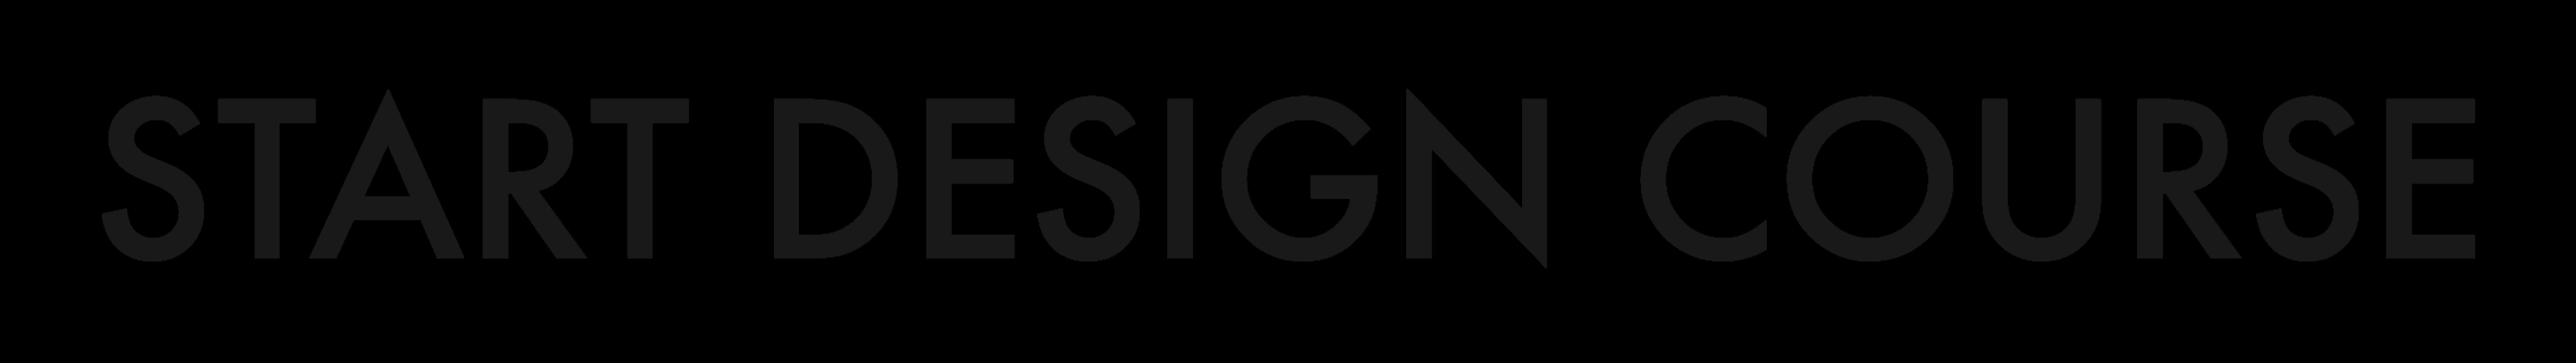 Start Design Course